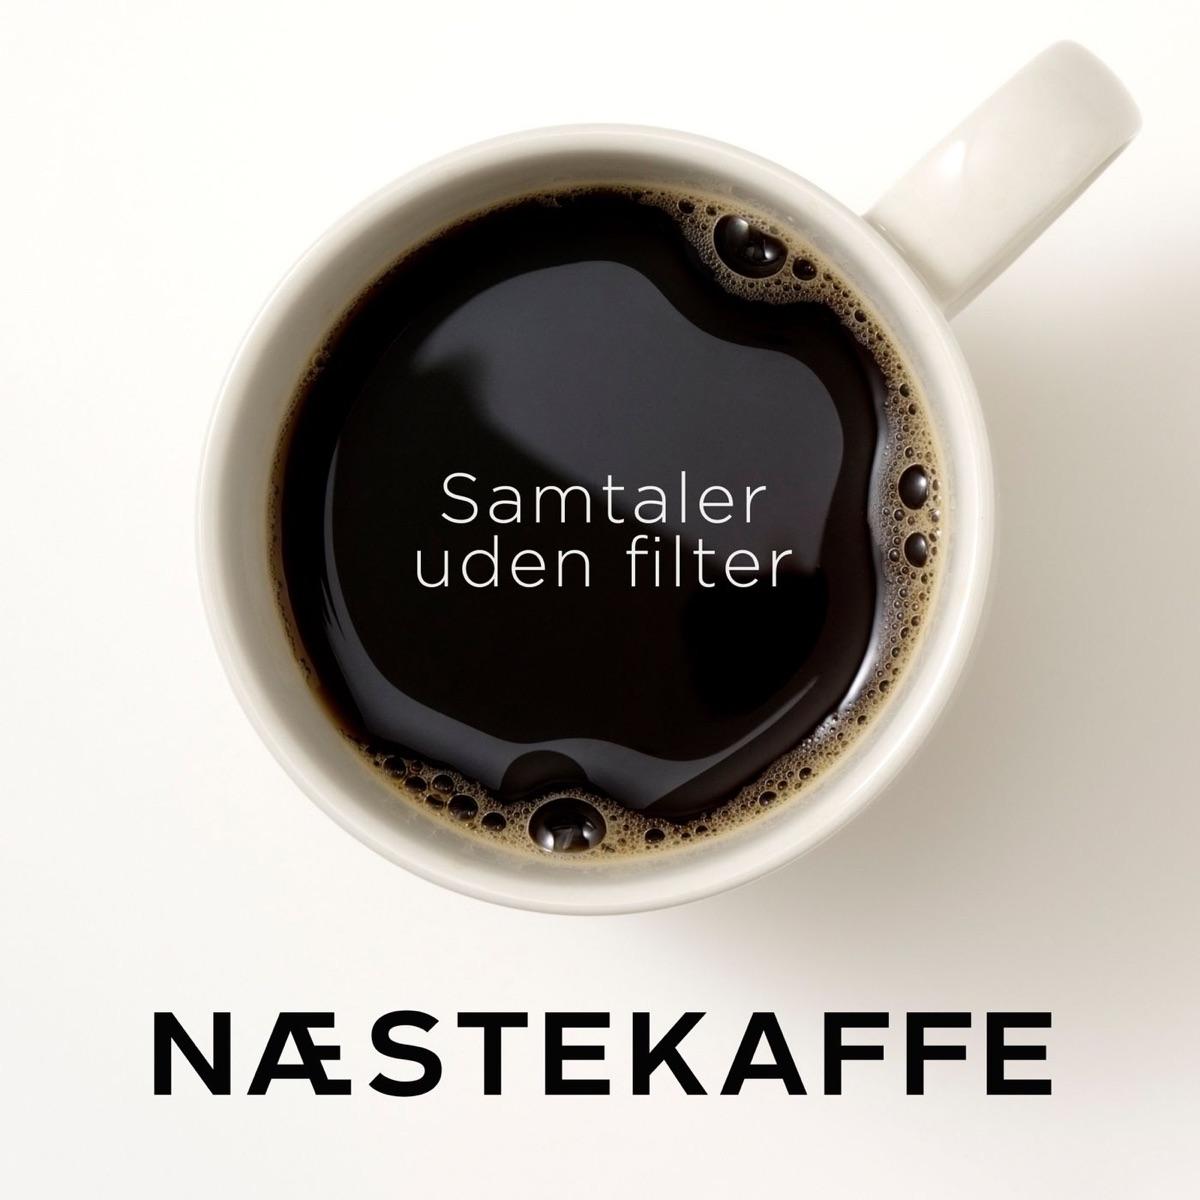 Næstekaffe